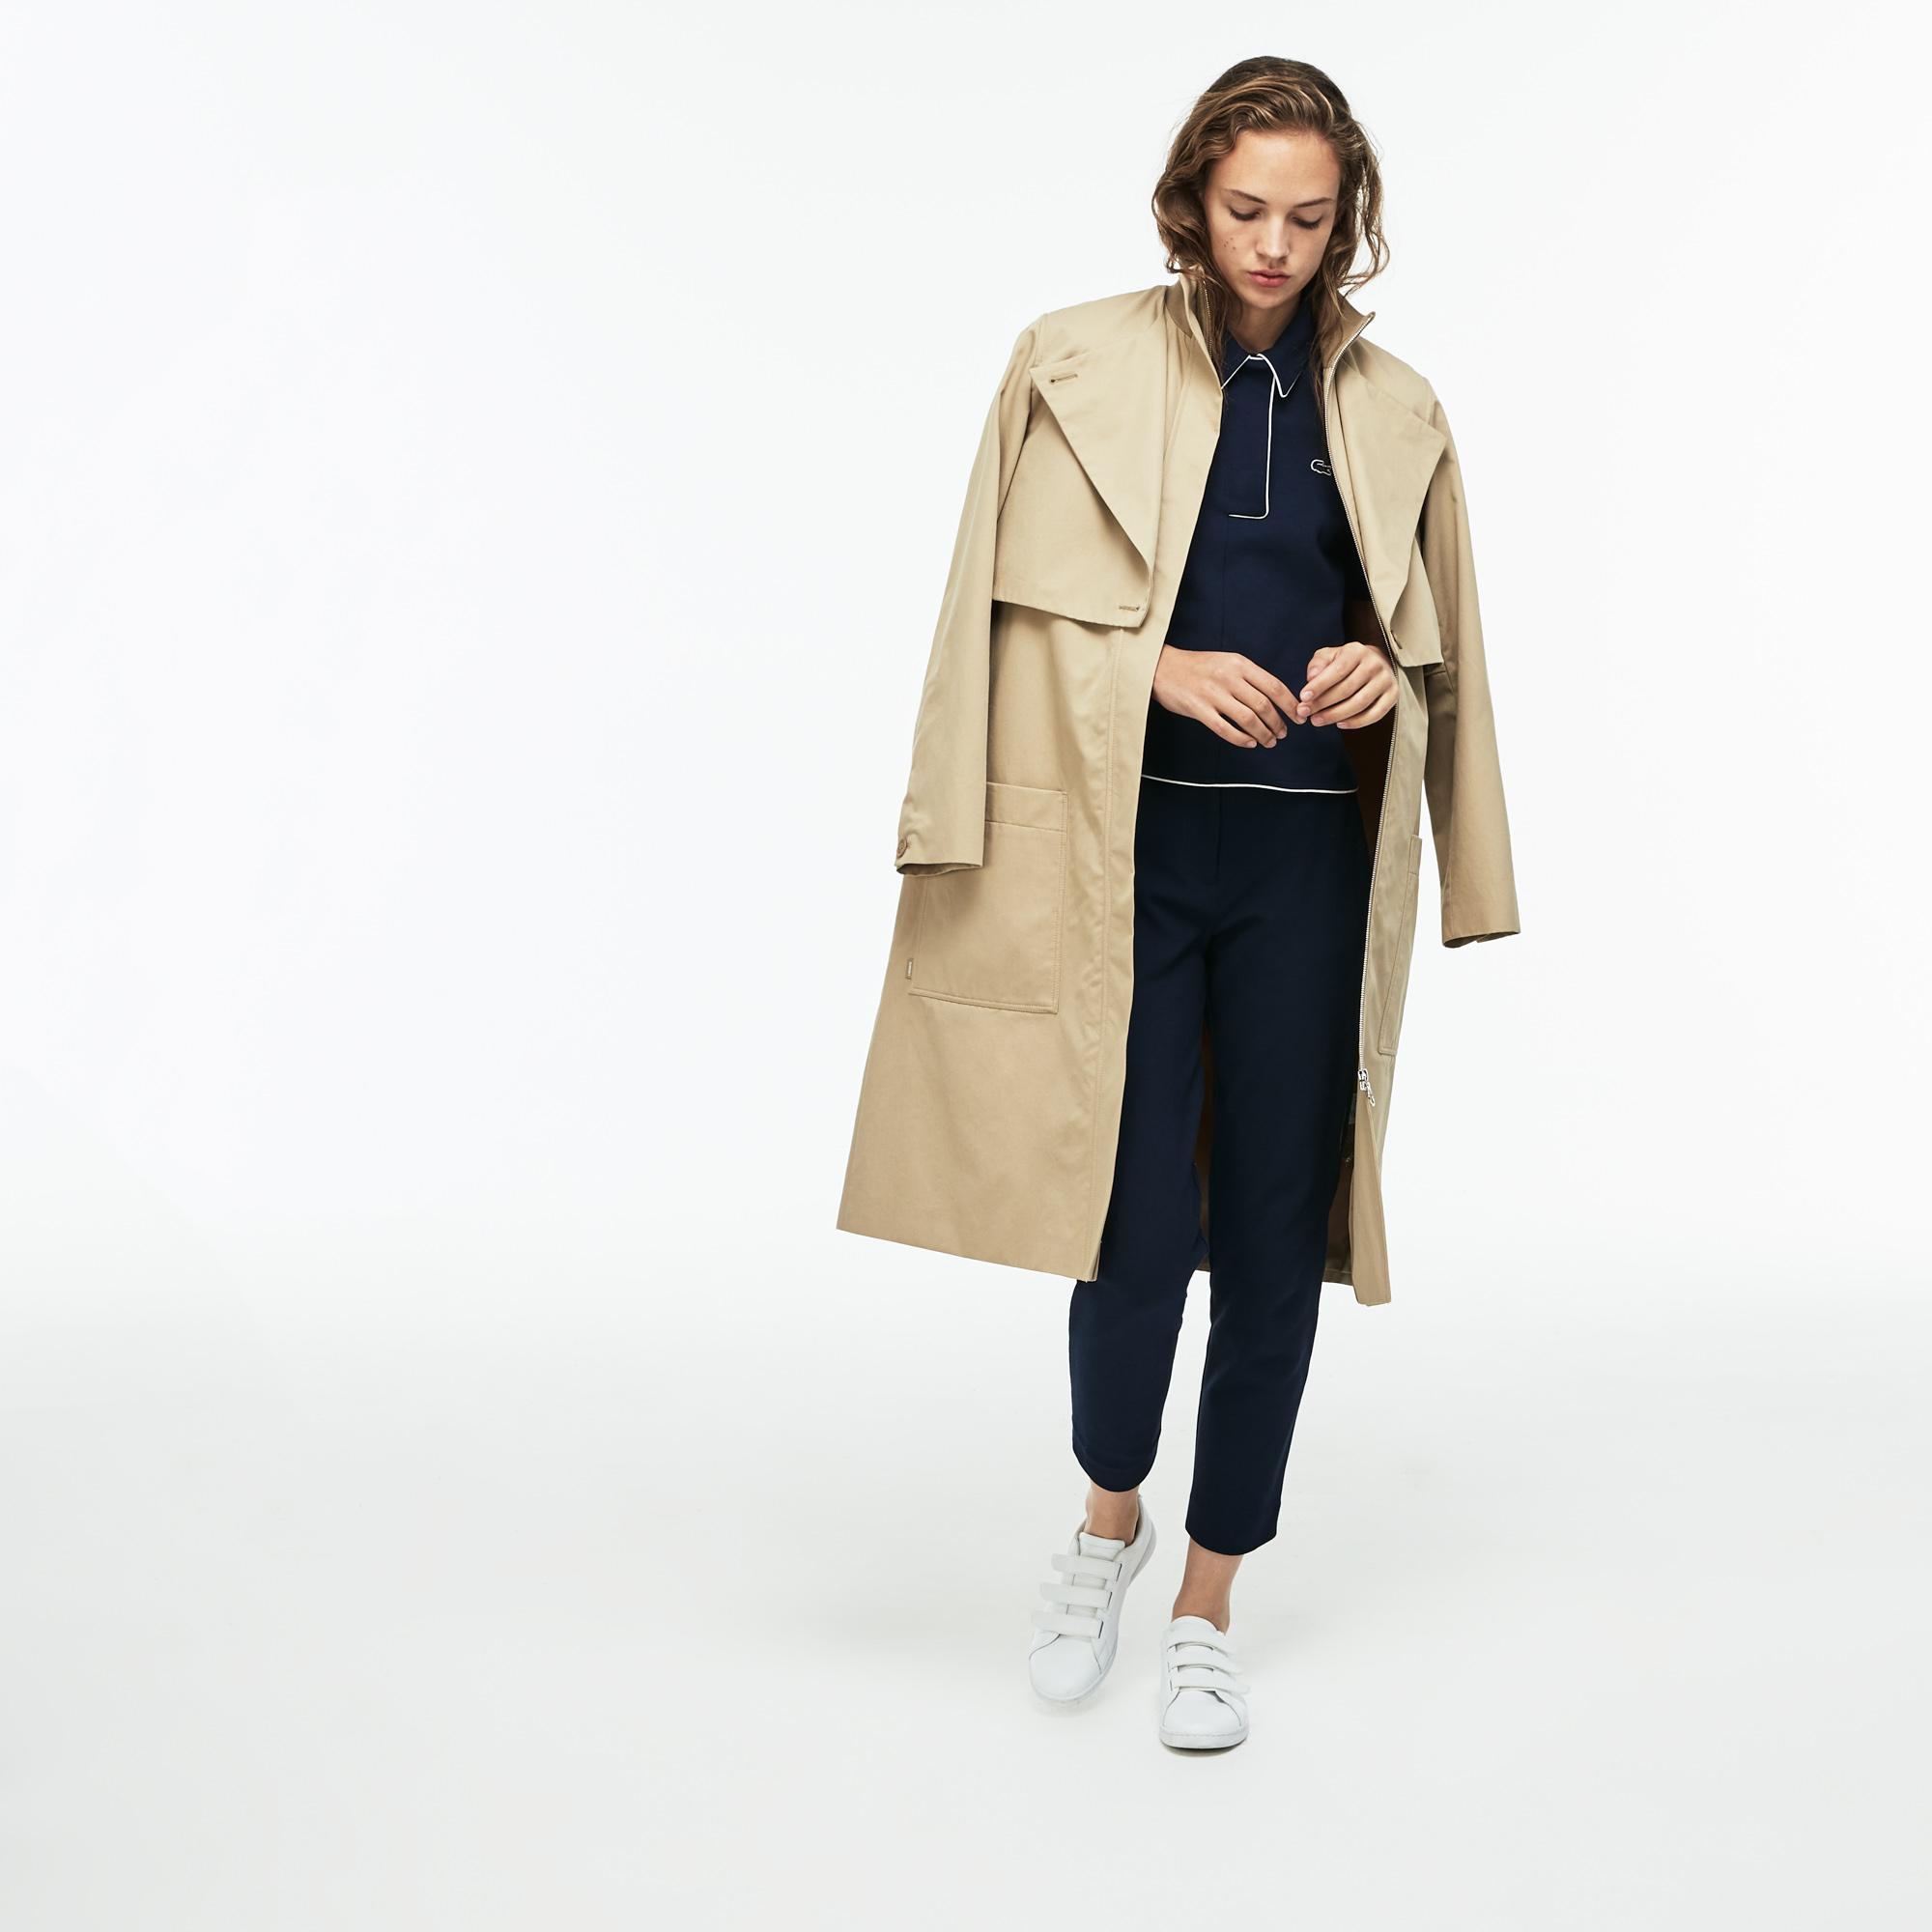 Купить Куртка Lacoste, бежевый, BF8915